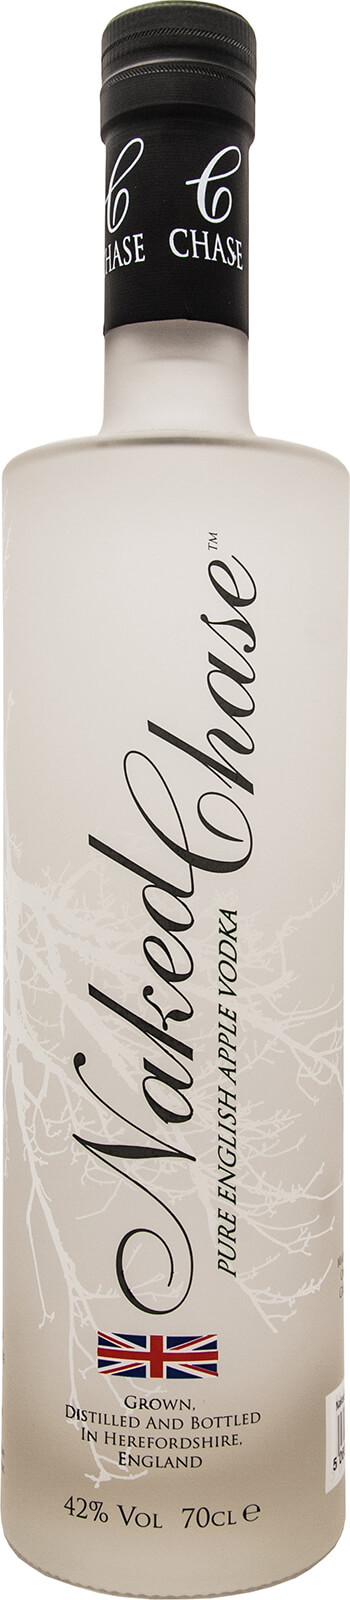 William Chase Naked Vodka 40% - Hofer Wine & Spirits